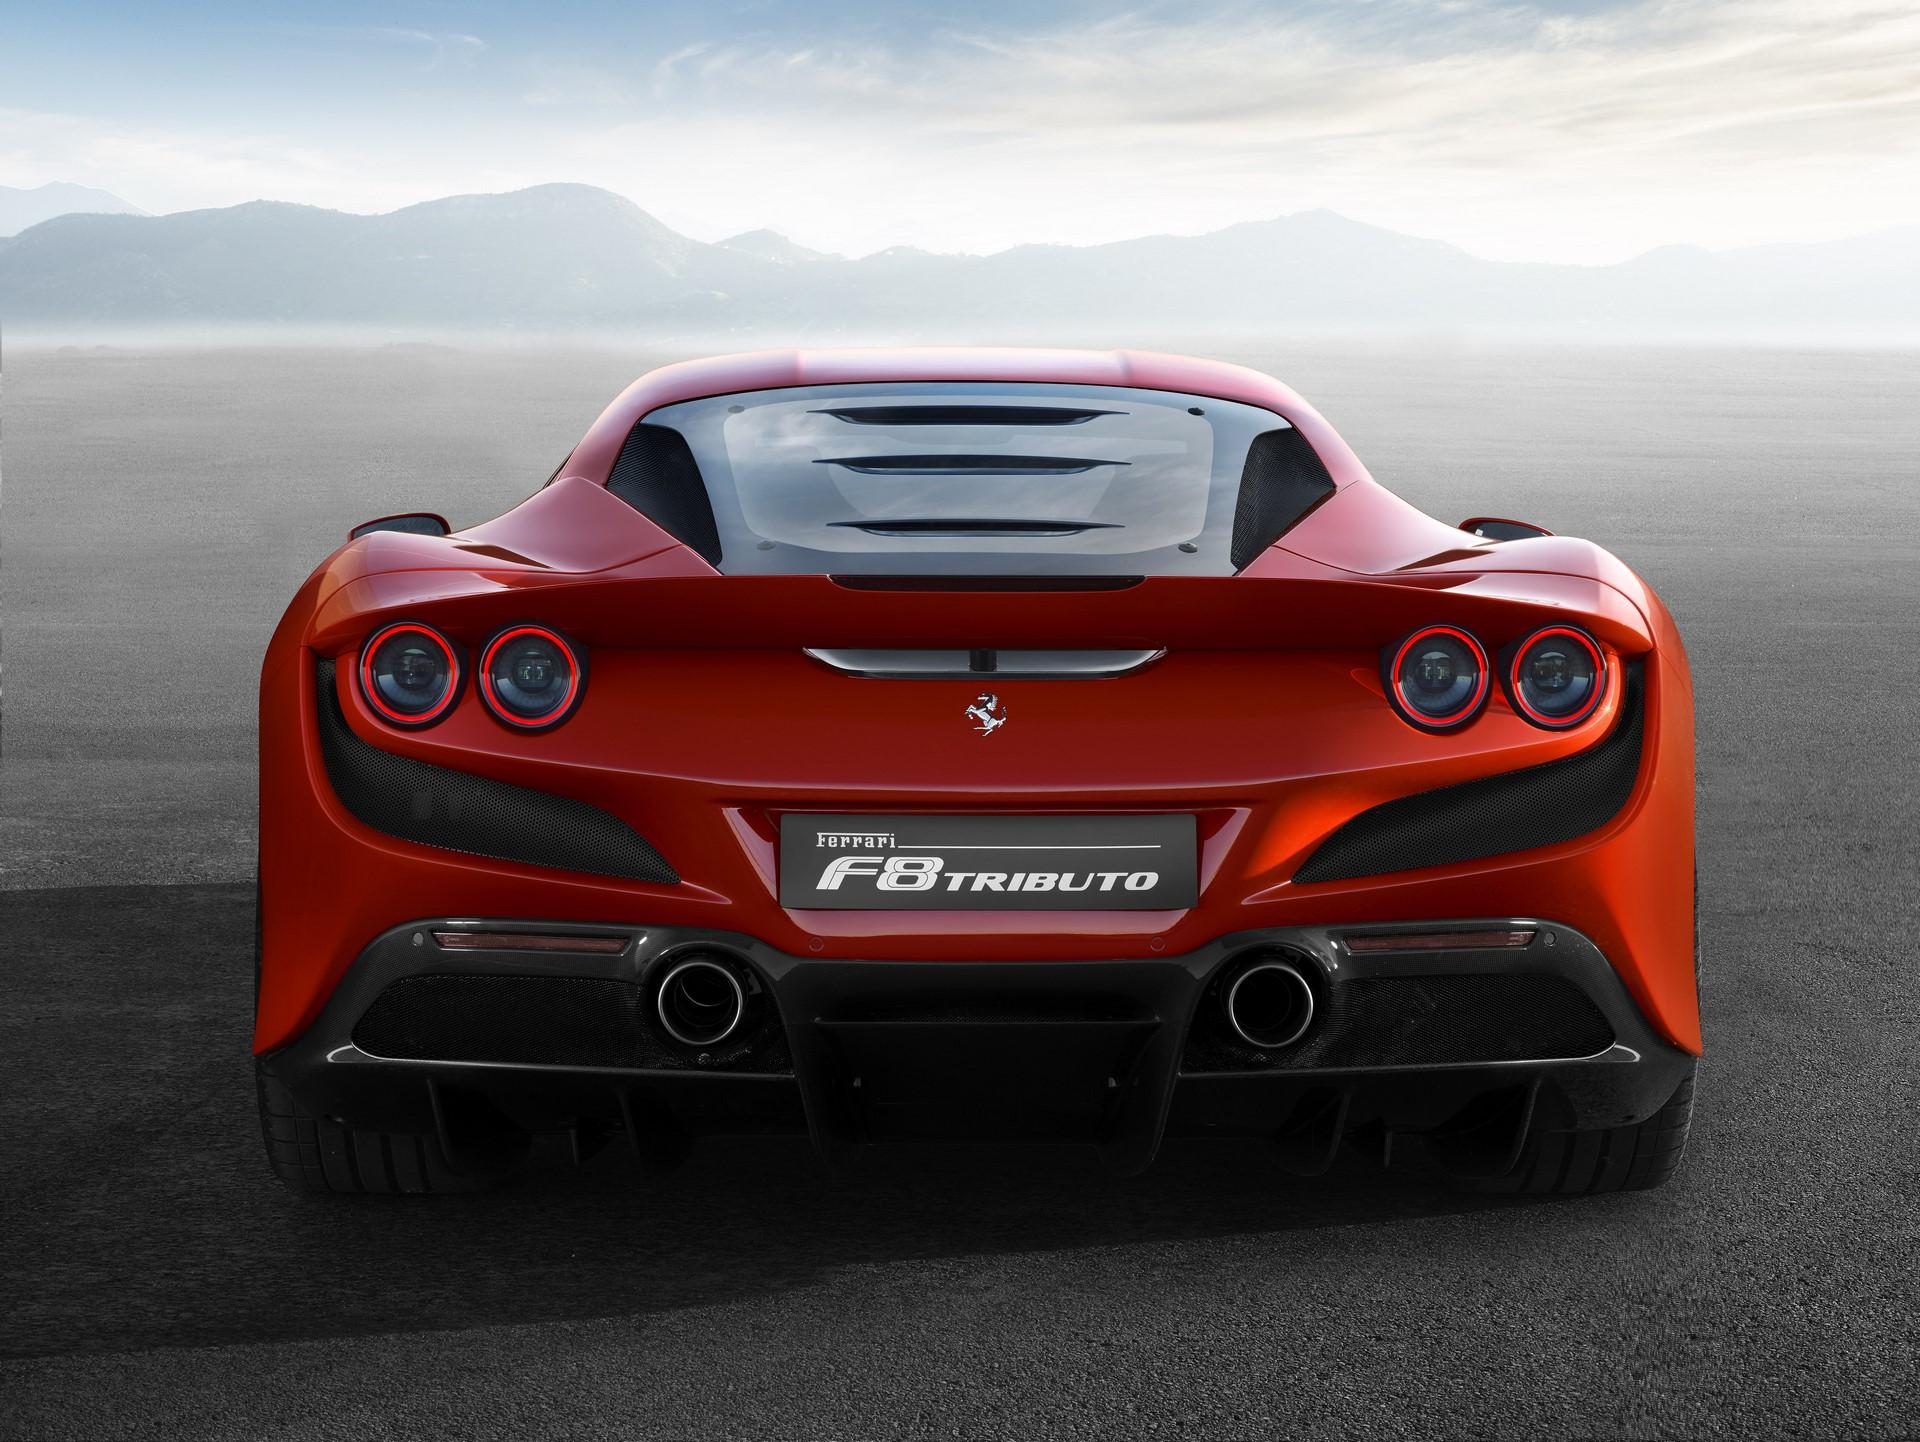 Ferrari F8 Tributo (5)